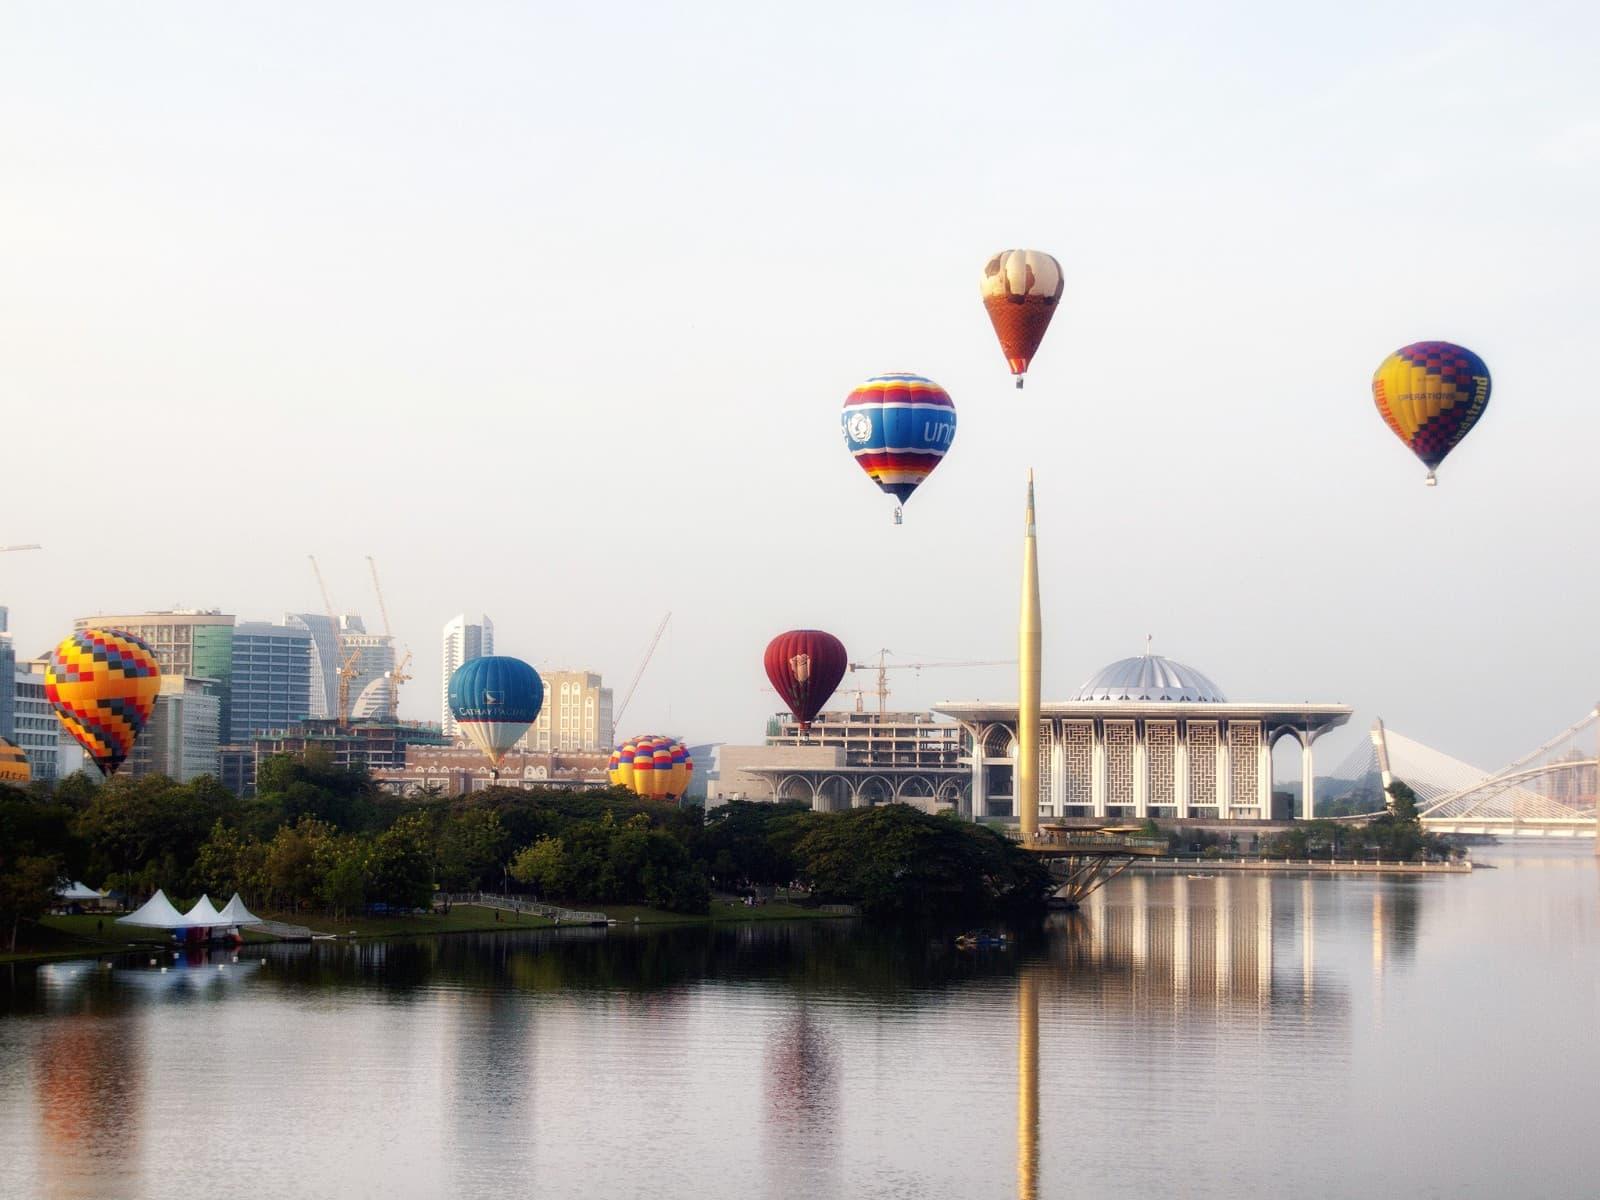 wisata balon udara malaysia